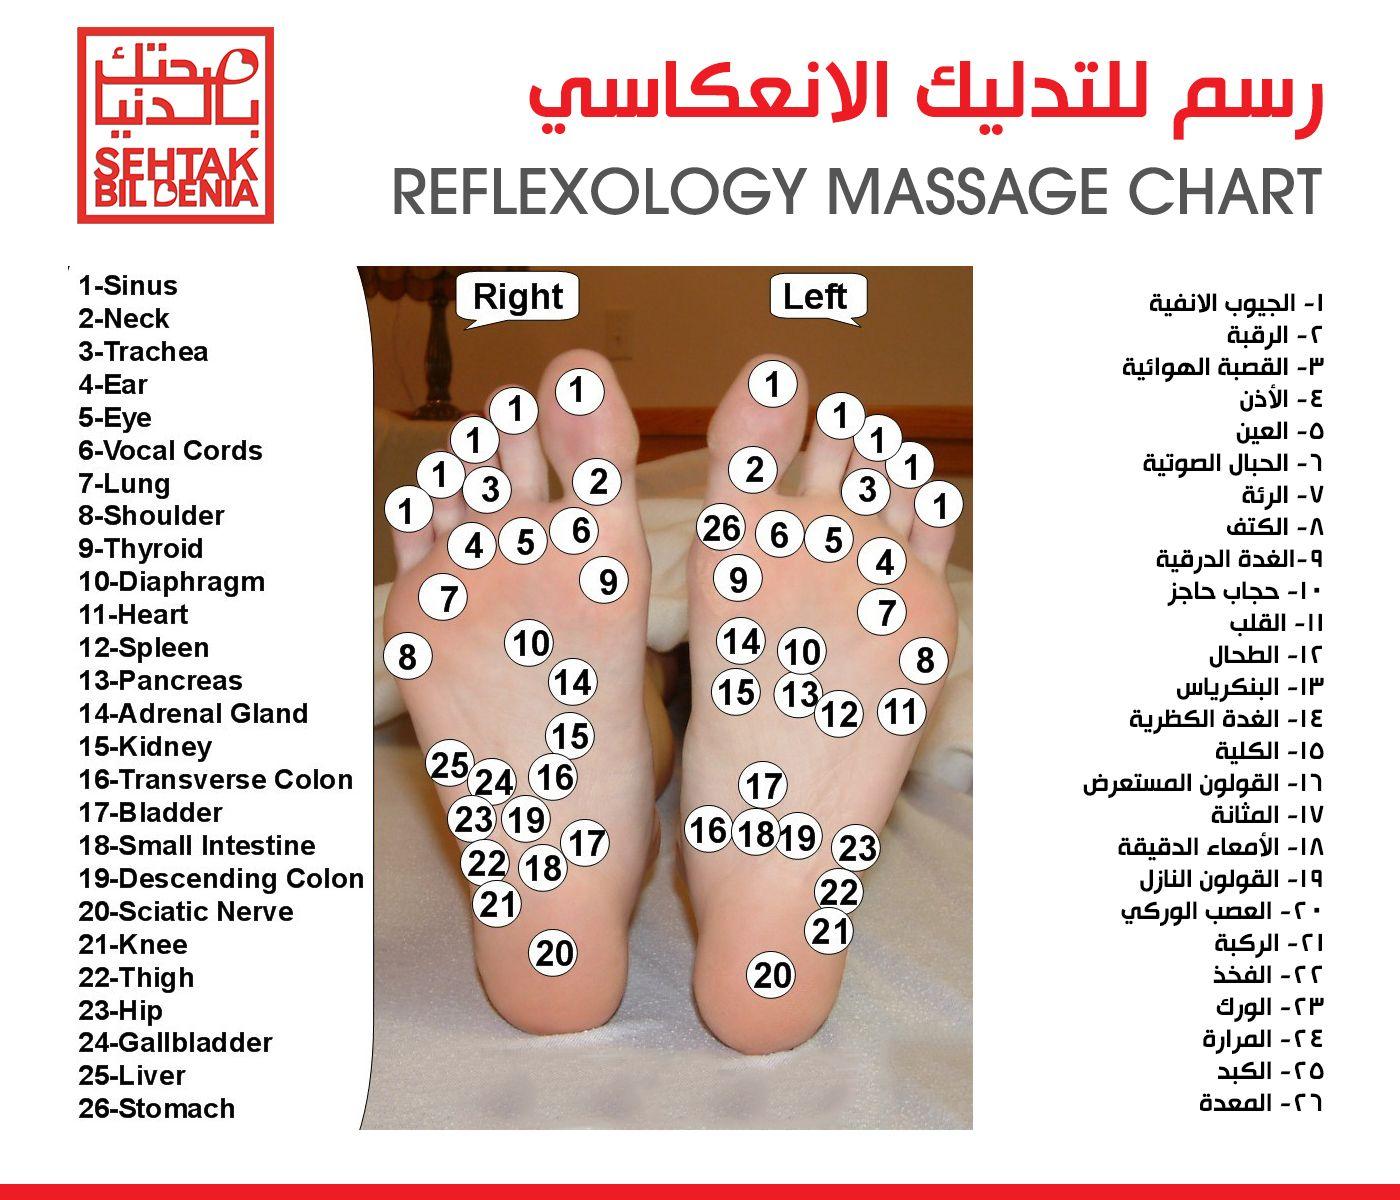 Timeline Photos Medlabs Sehtak Bil Denia Reflexology Reflexology Chart Massage Therapy